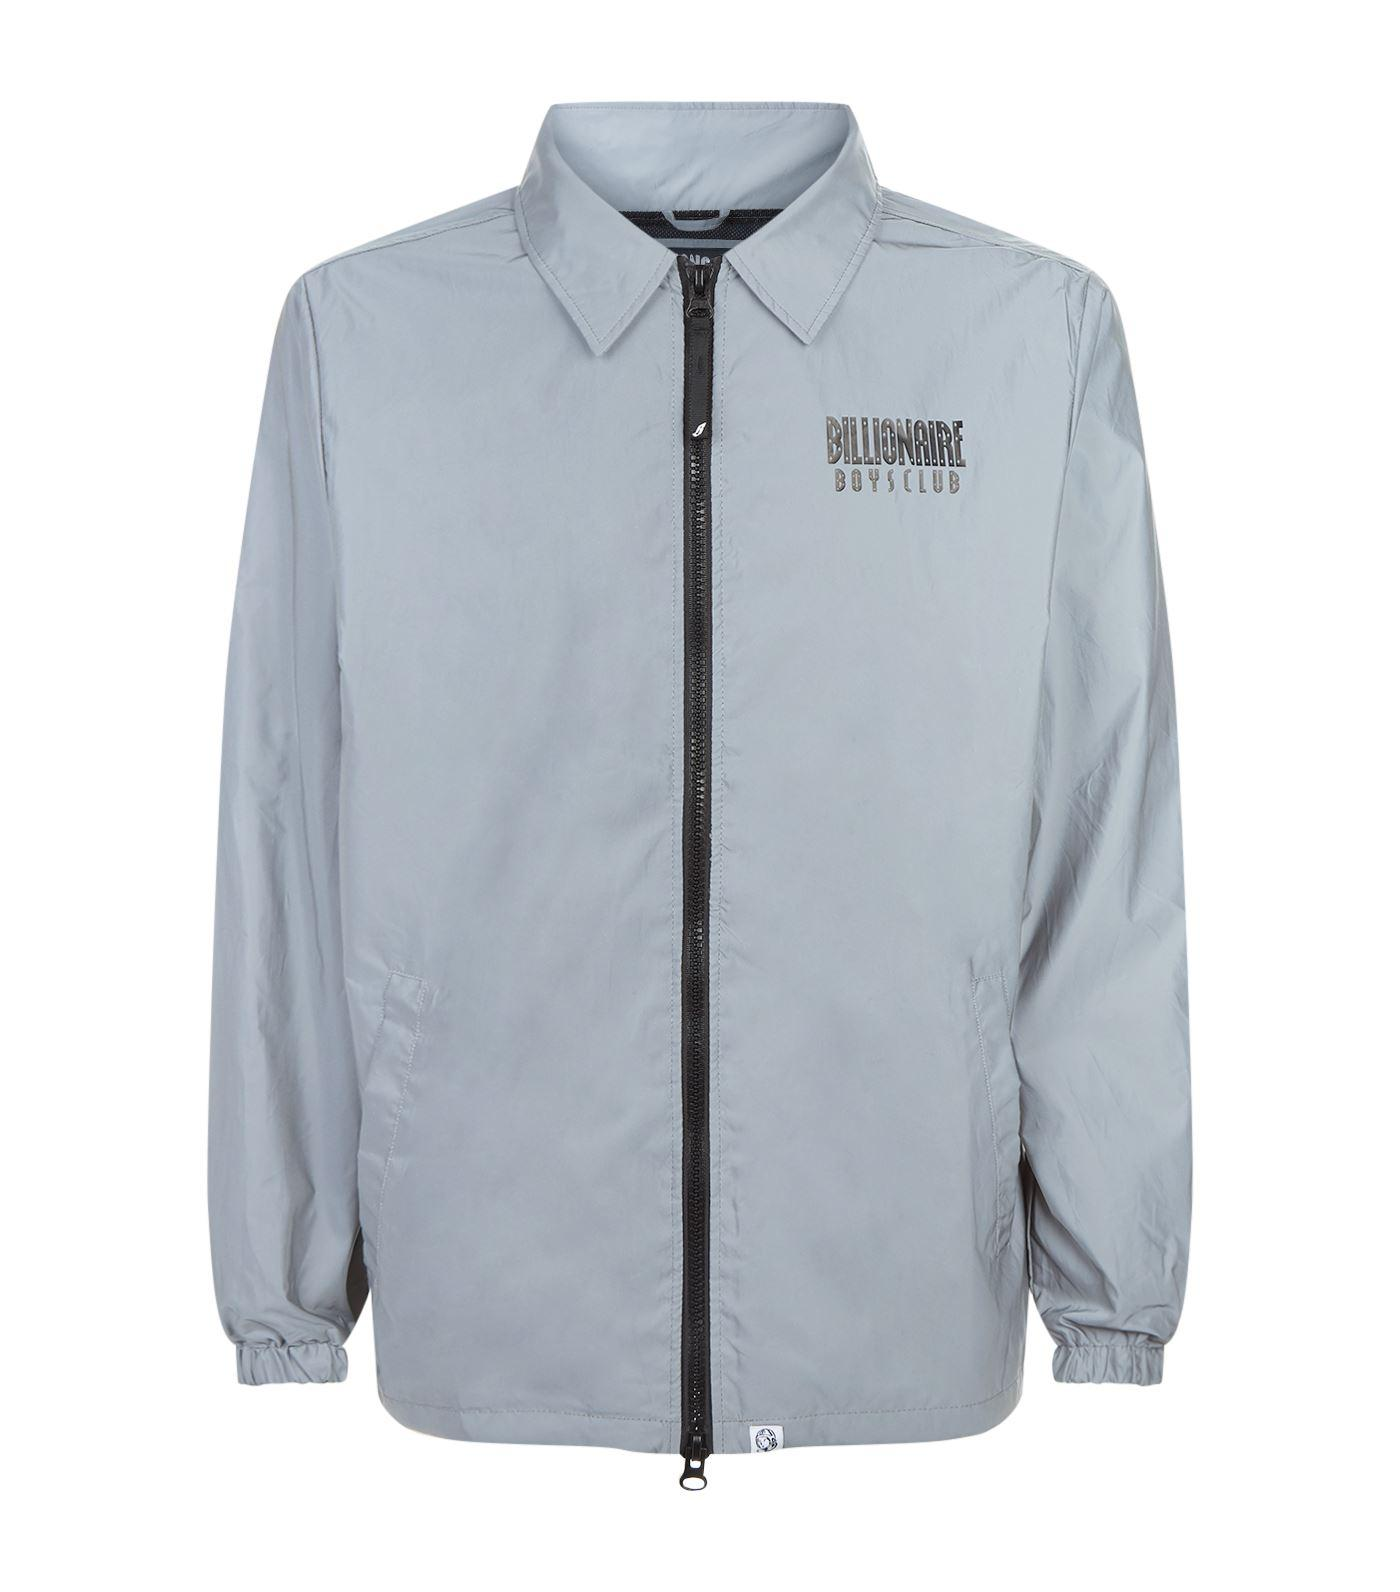 943ed13ce Billionaire Boys Club Reflective Coach Jacket In Silver | ModeSens